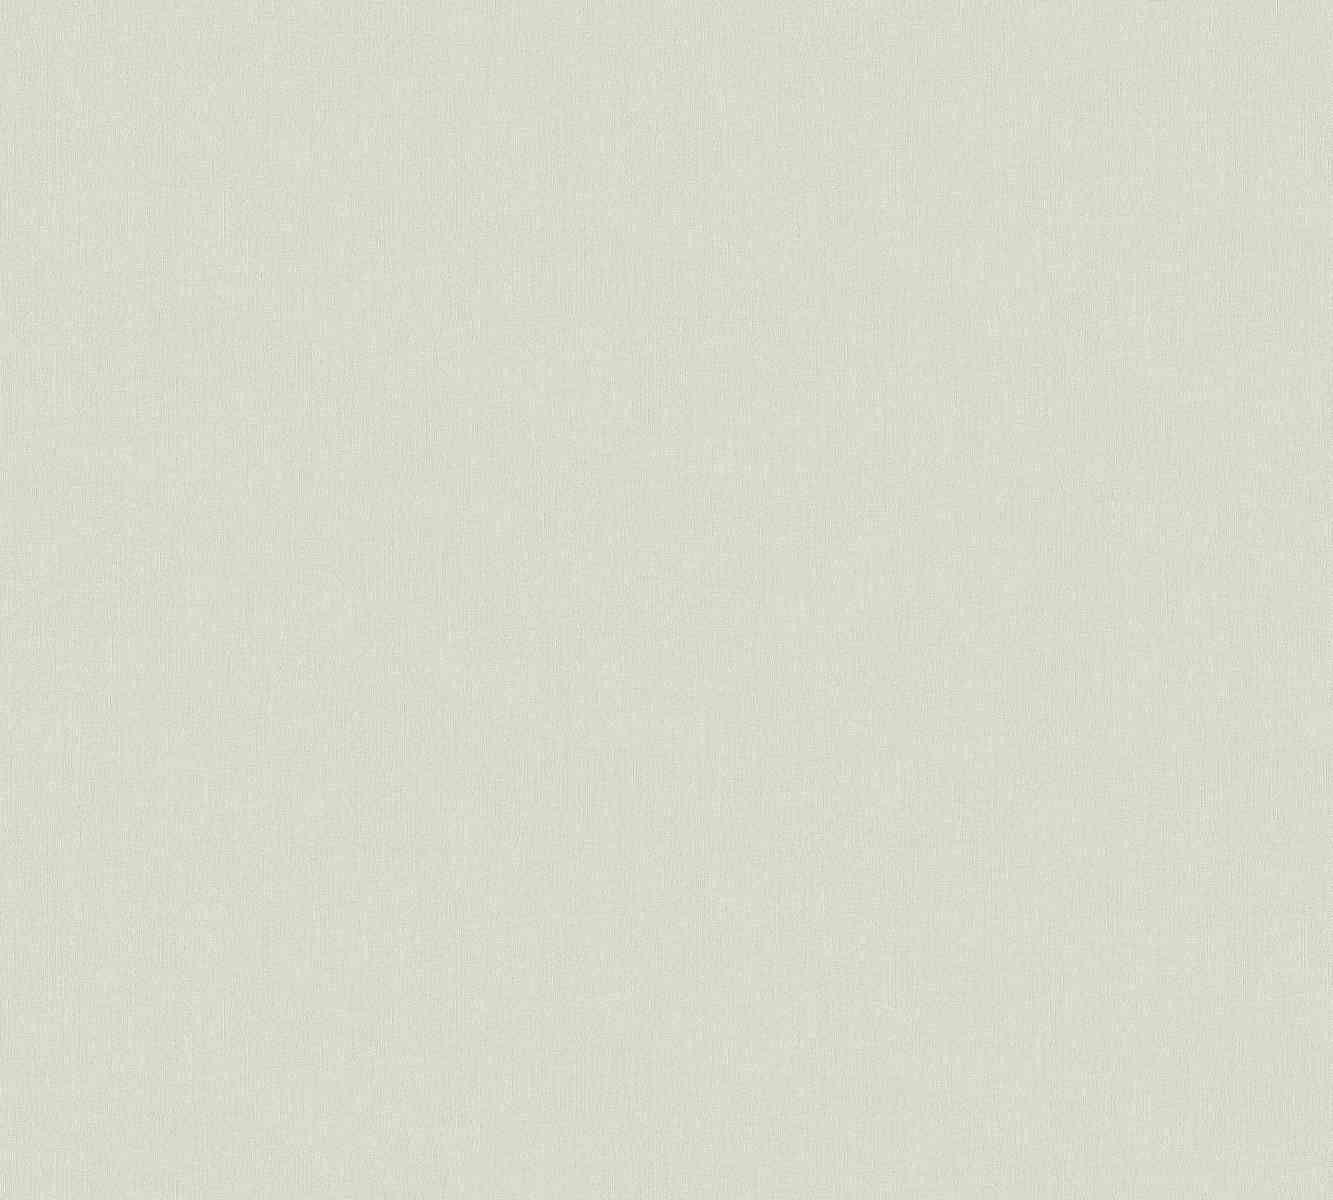 mystique plain colour wall paper grey metallic 335912